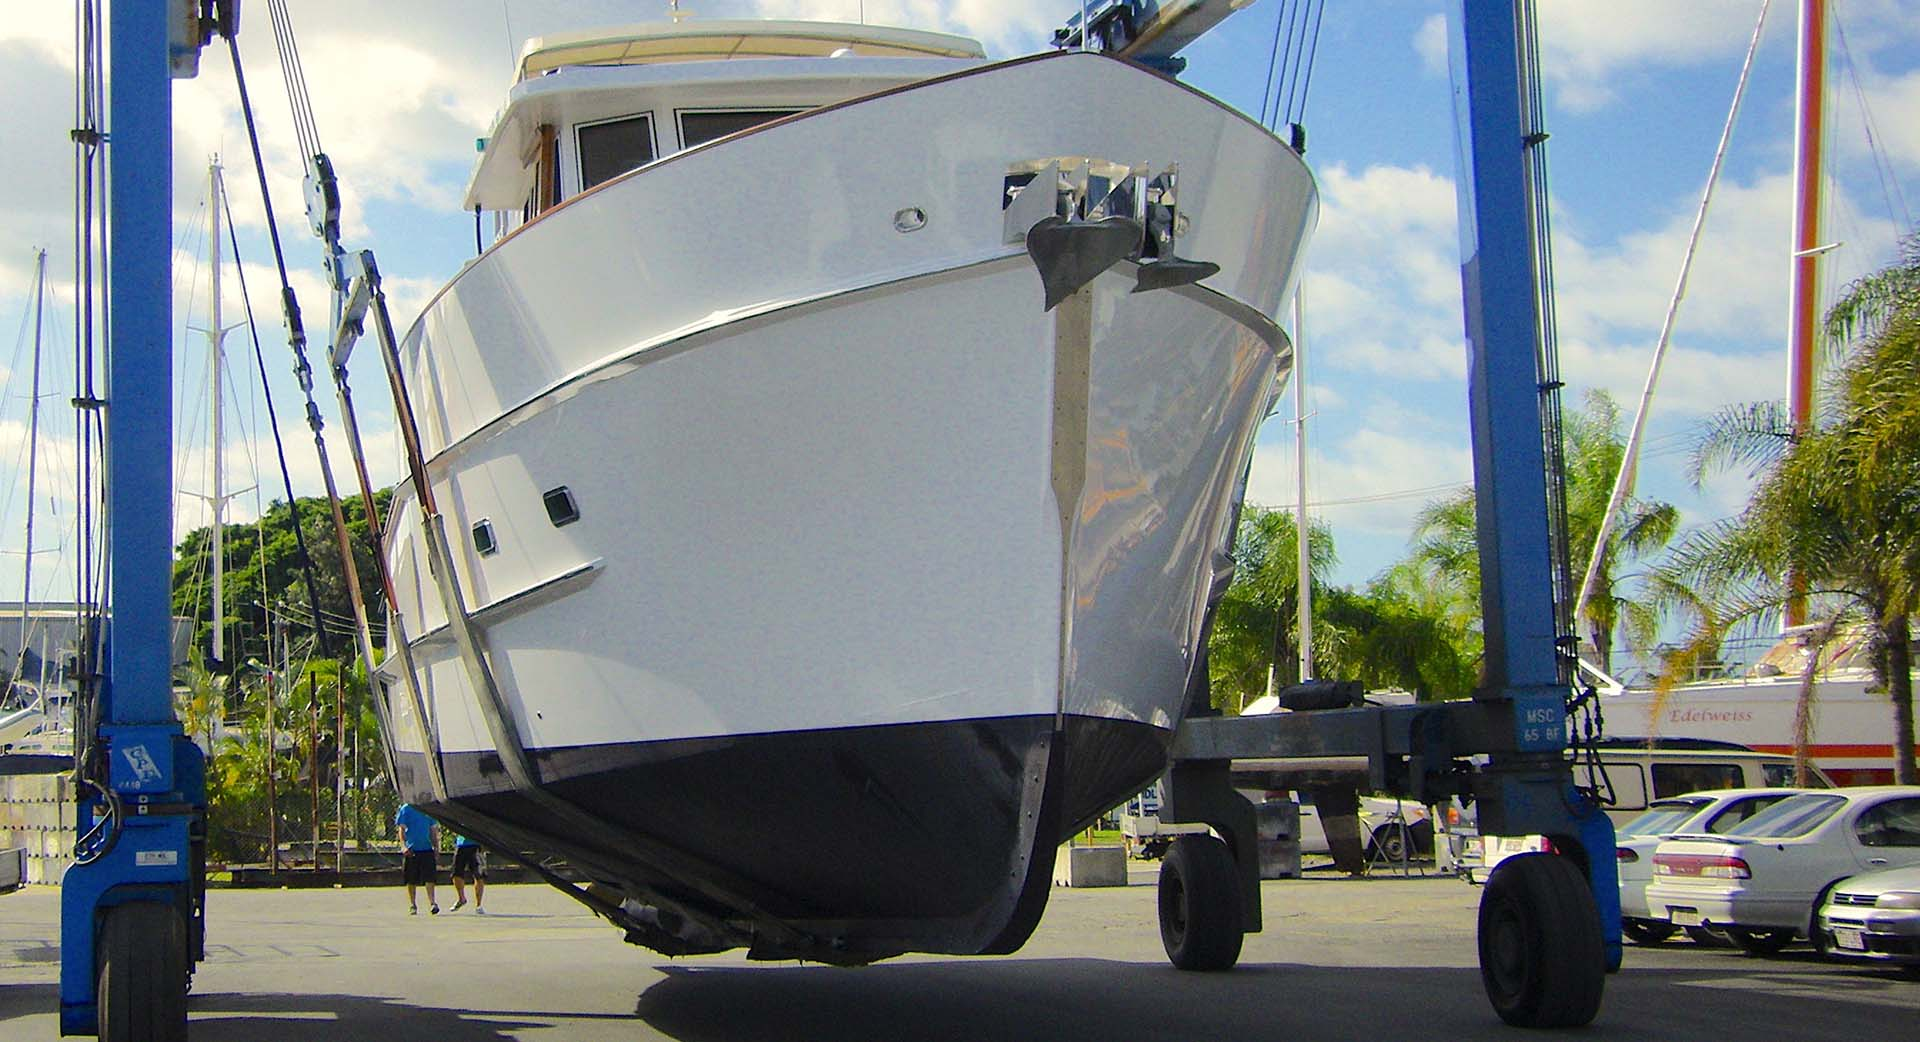 Boat yard services Queensland